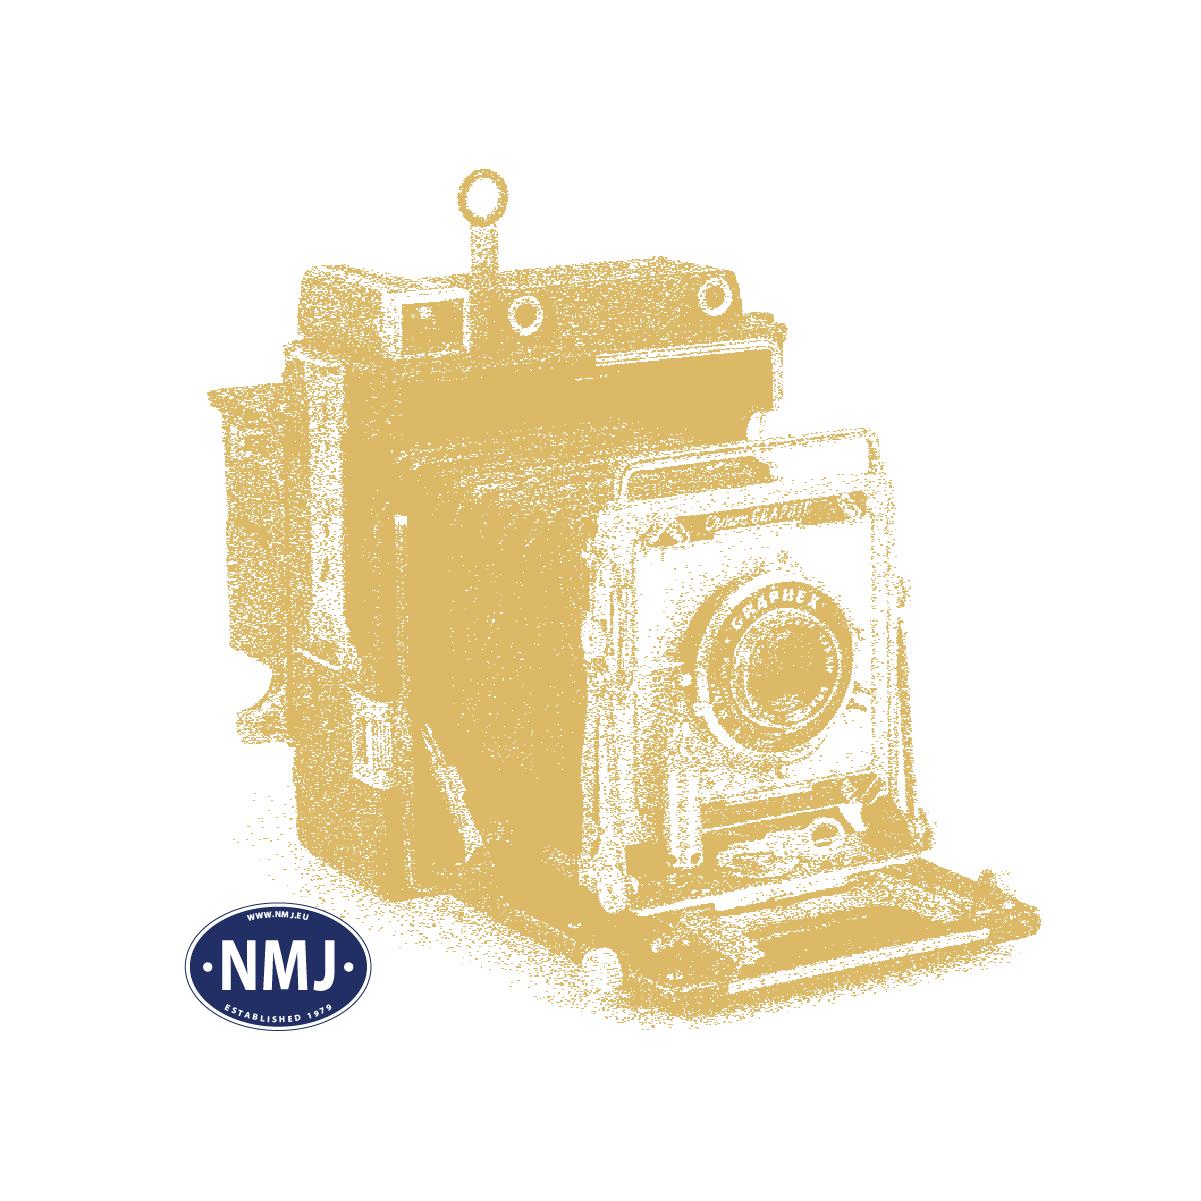 NMJS21a176 - NMJ Superline NSB Type 21a 176